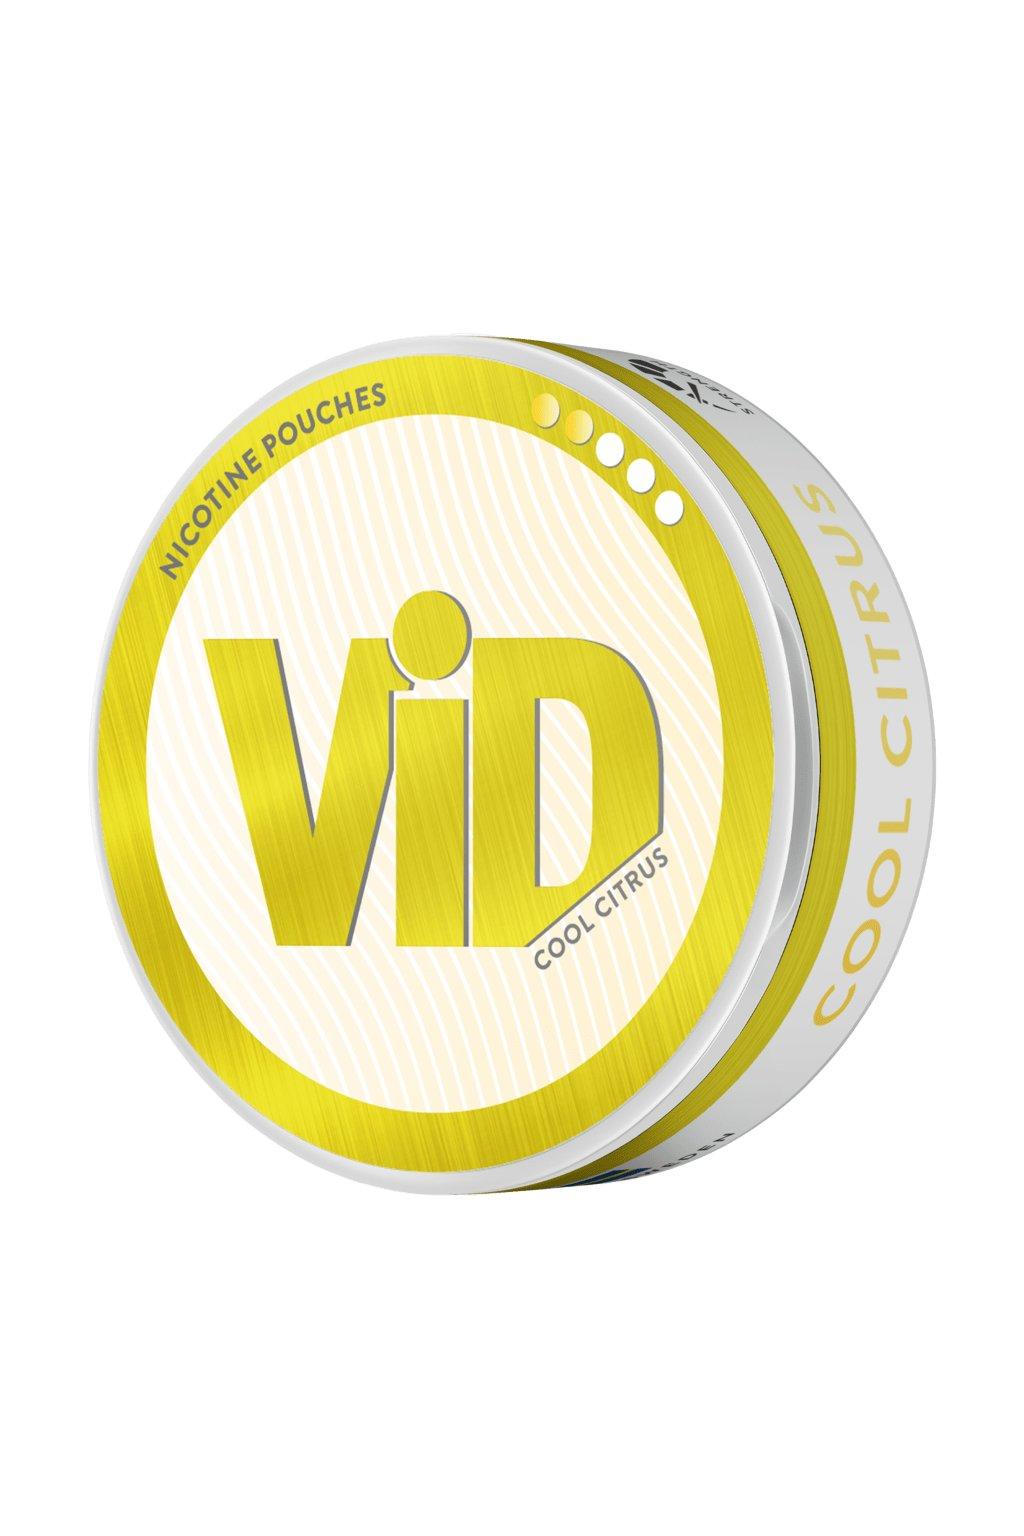 VID Cool citrus nikotinove sacky nicopods